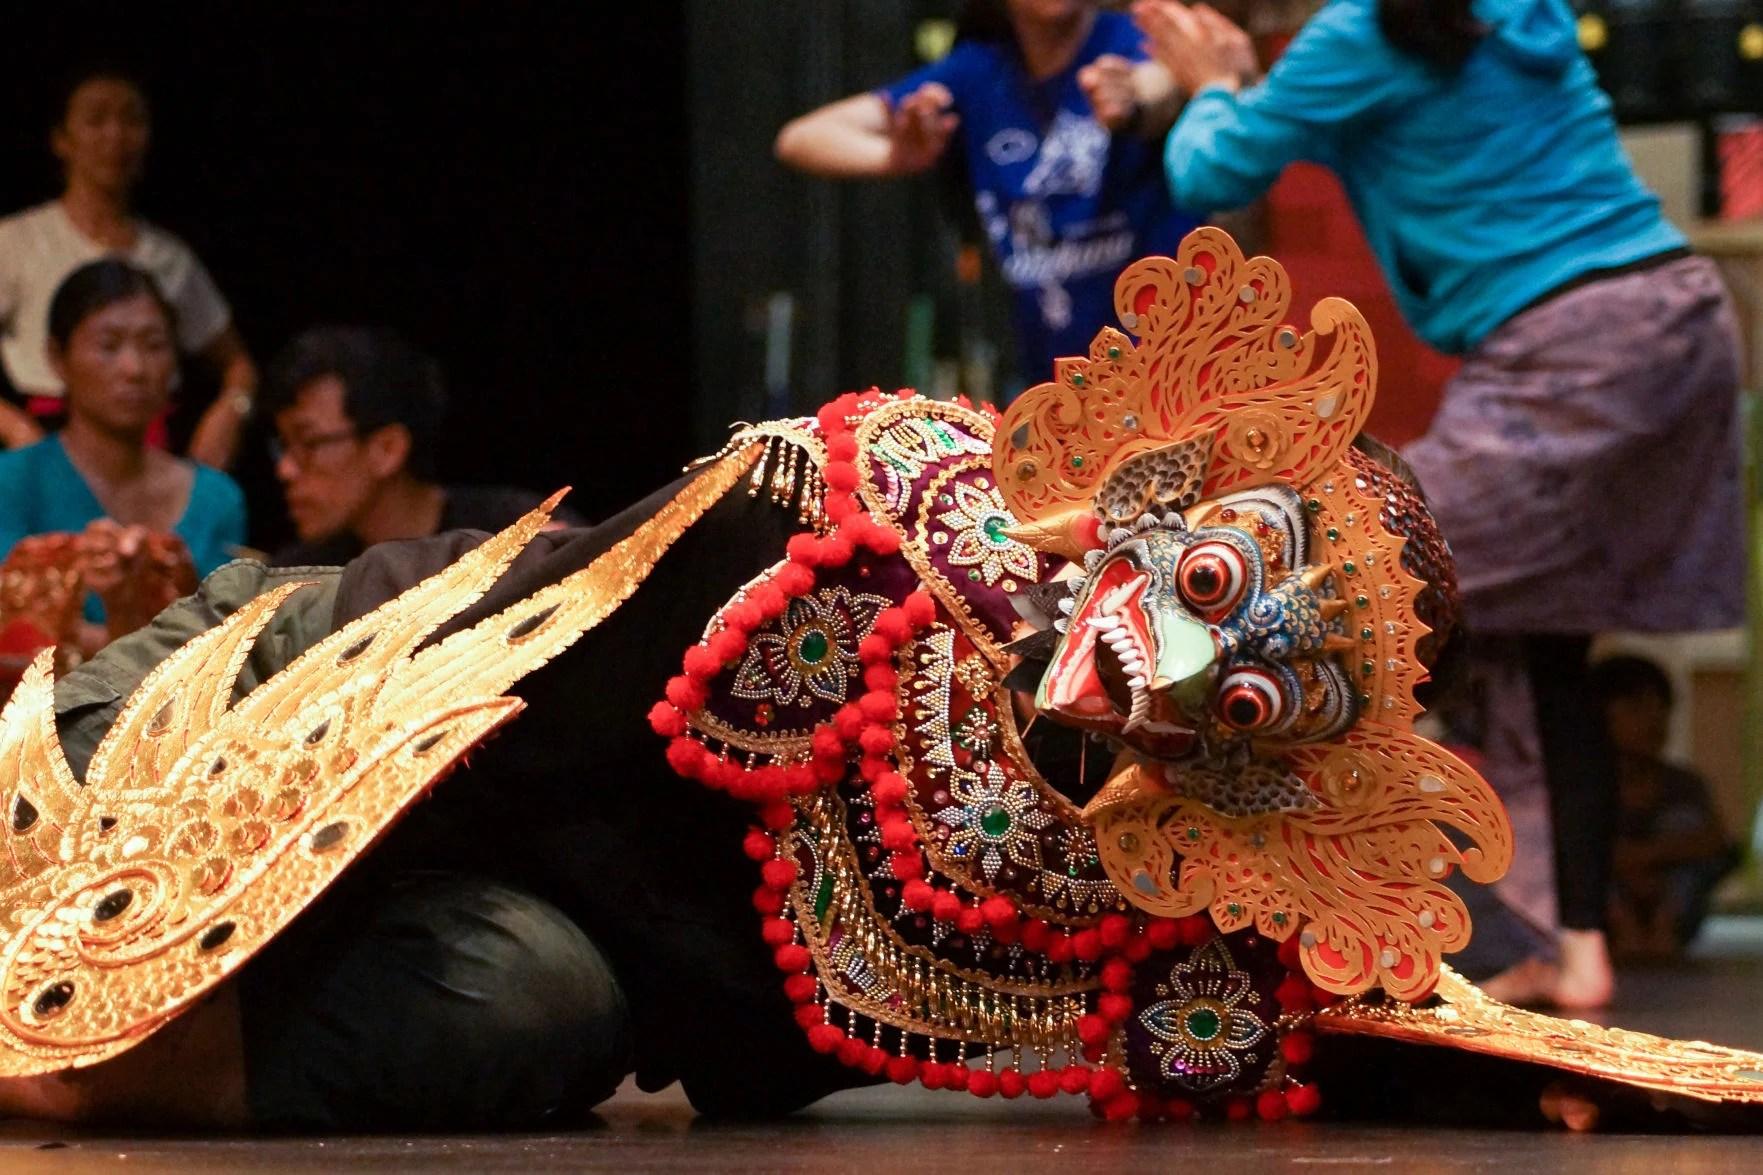 Ramayana performer in partial costume